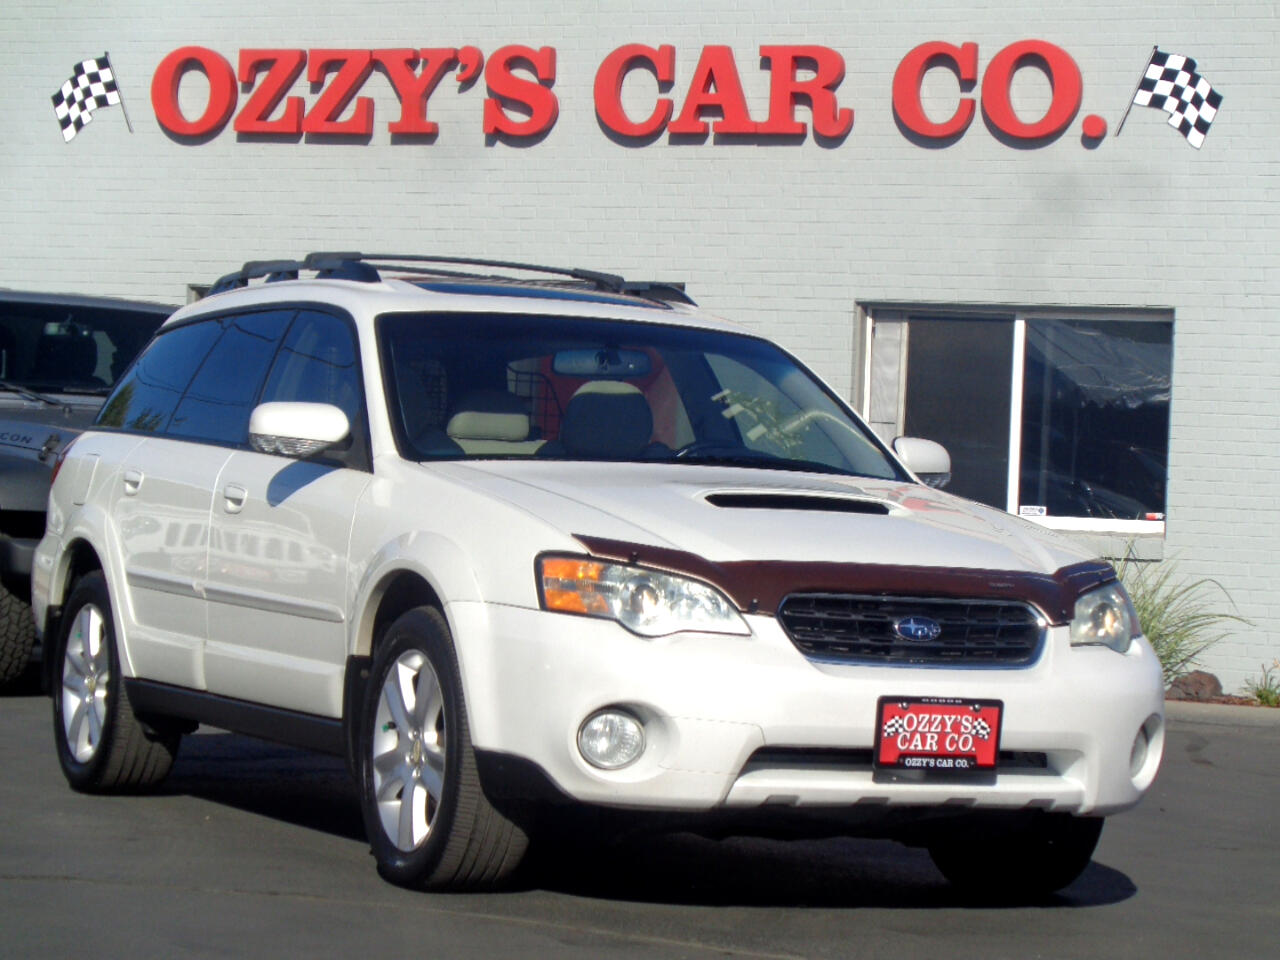 2006 Subaru Legacy Wagon Outback 2.5 XT Ltd Auto Ivory Int